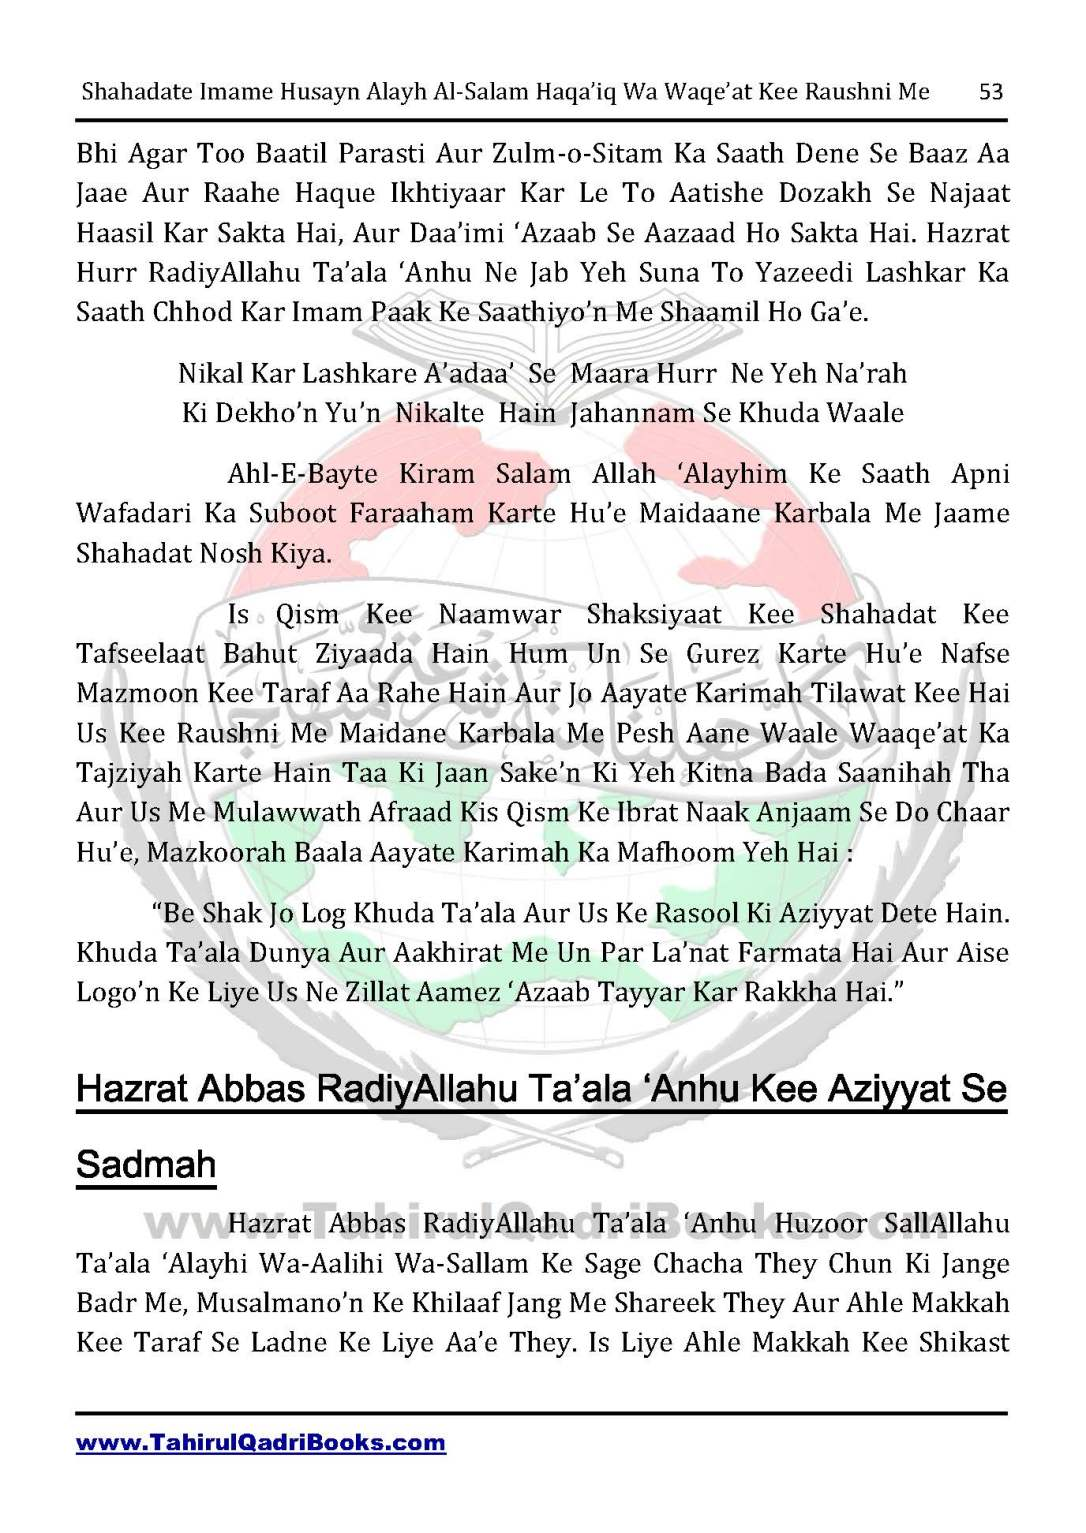 shahadate-imame-husayn-alayh-is-salam-haqaiq-wa-waqe_at-kee-raushni-me-in-roman-urdu-unlocked_Page_53